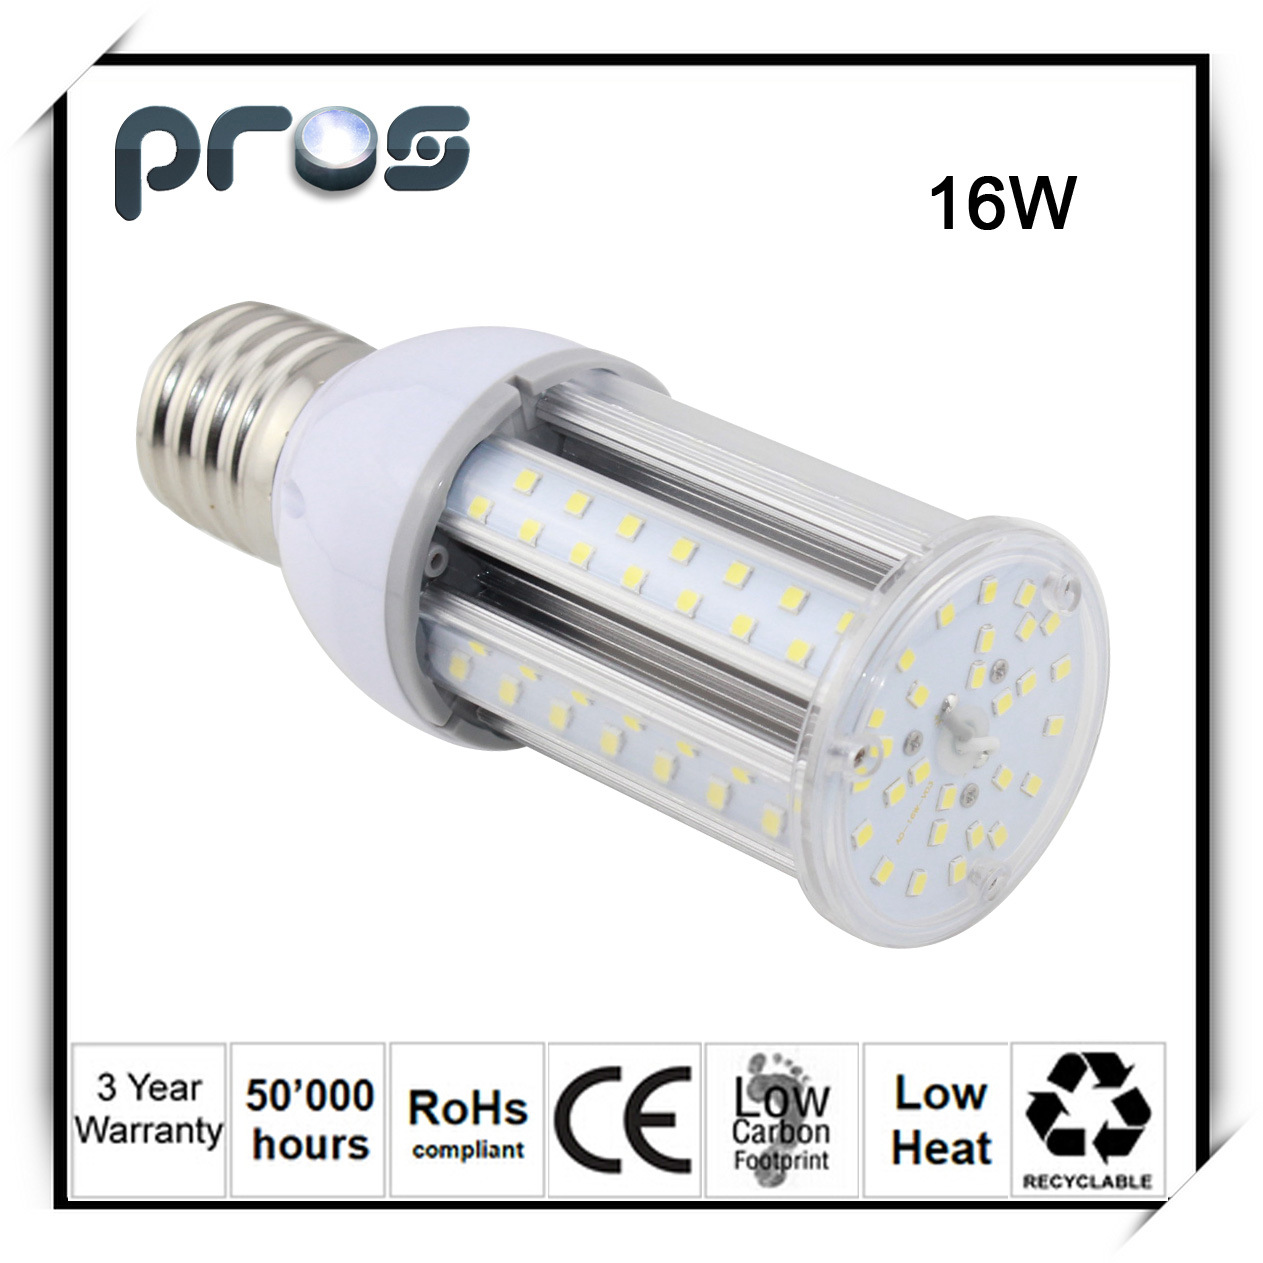 E27 12W 16W 20W 24W LED Corn Street Light 360 Degree Light Degree IP64